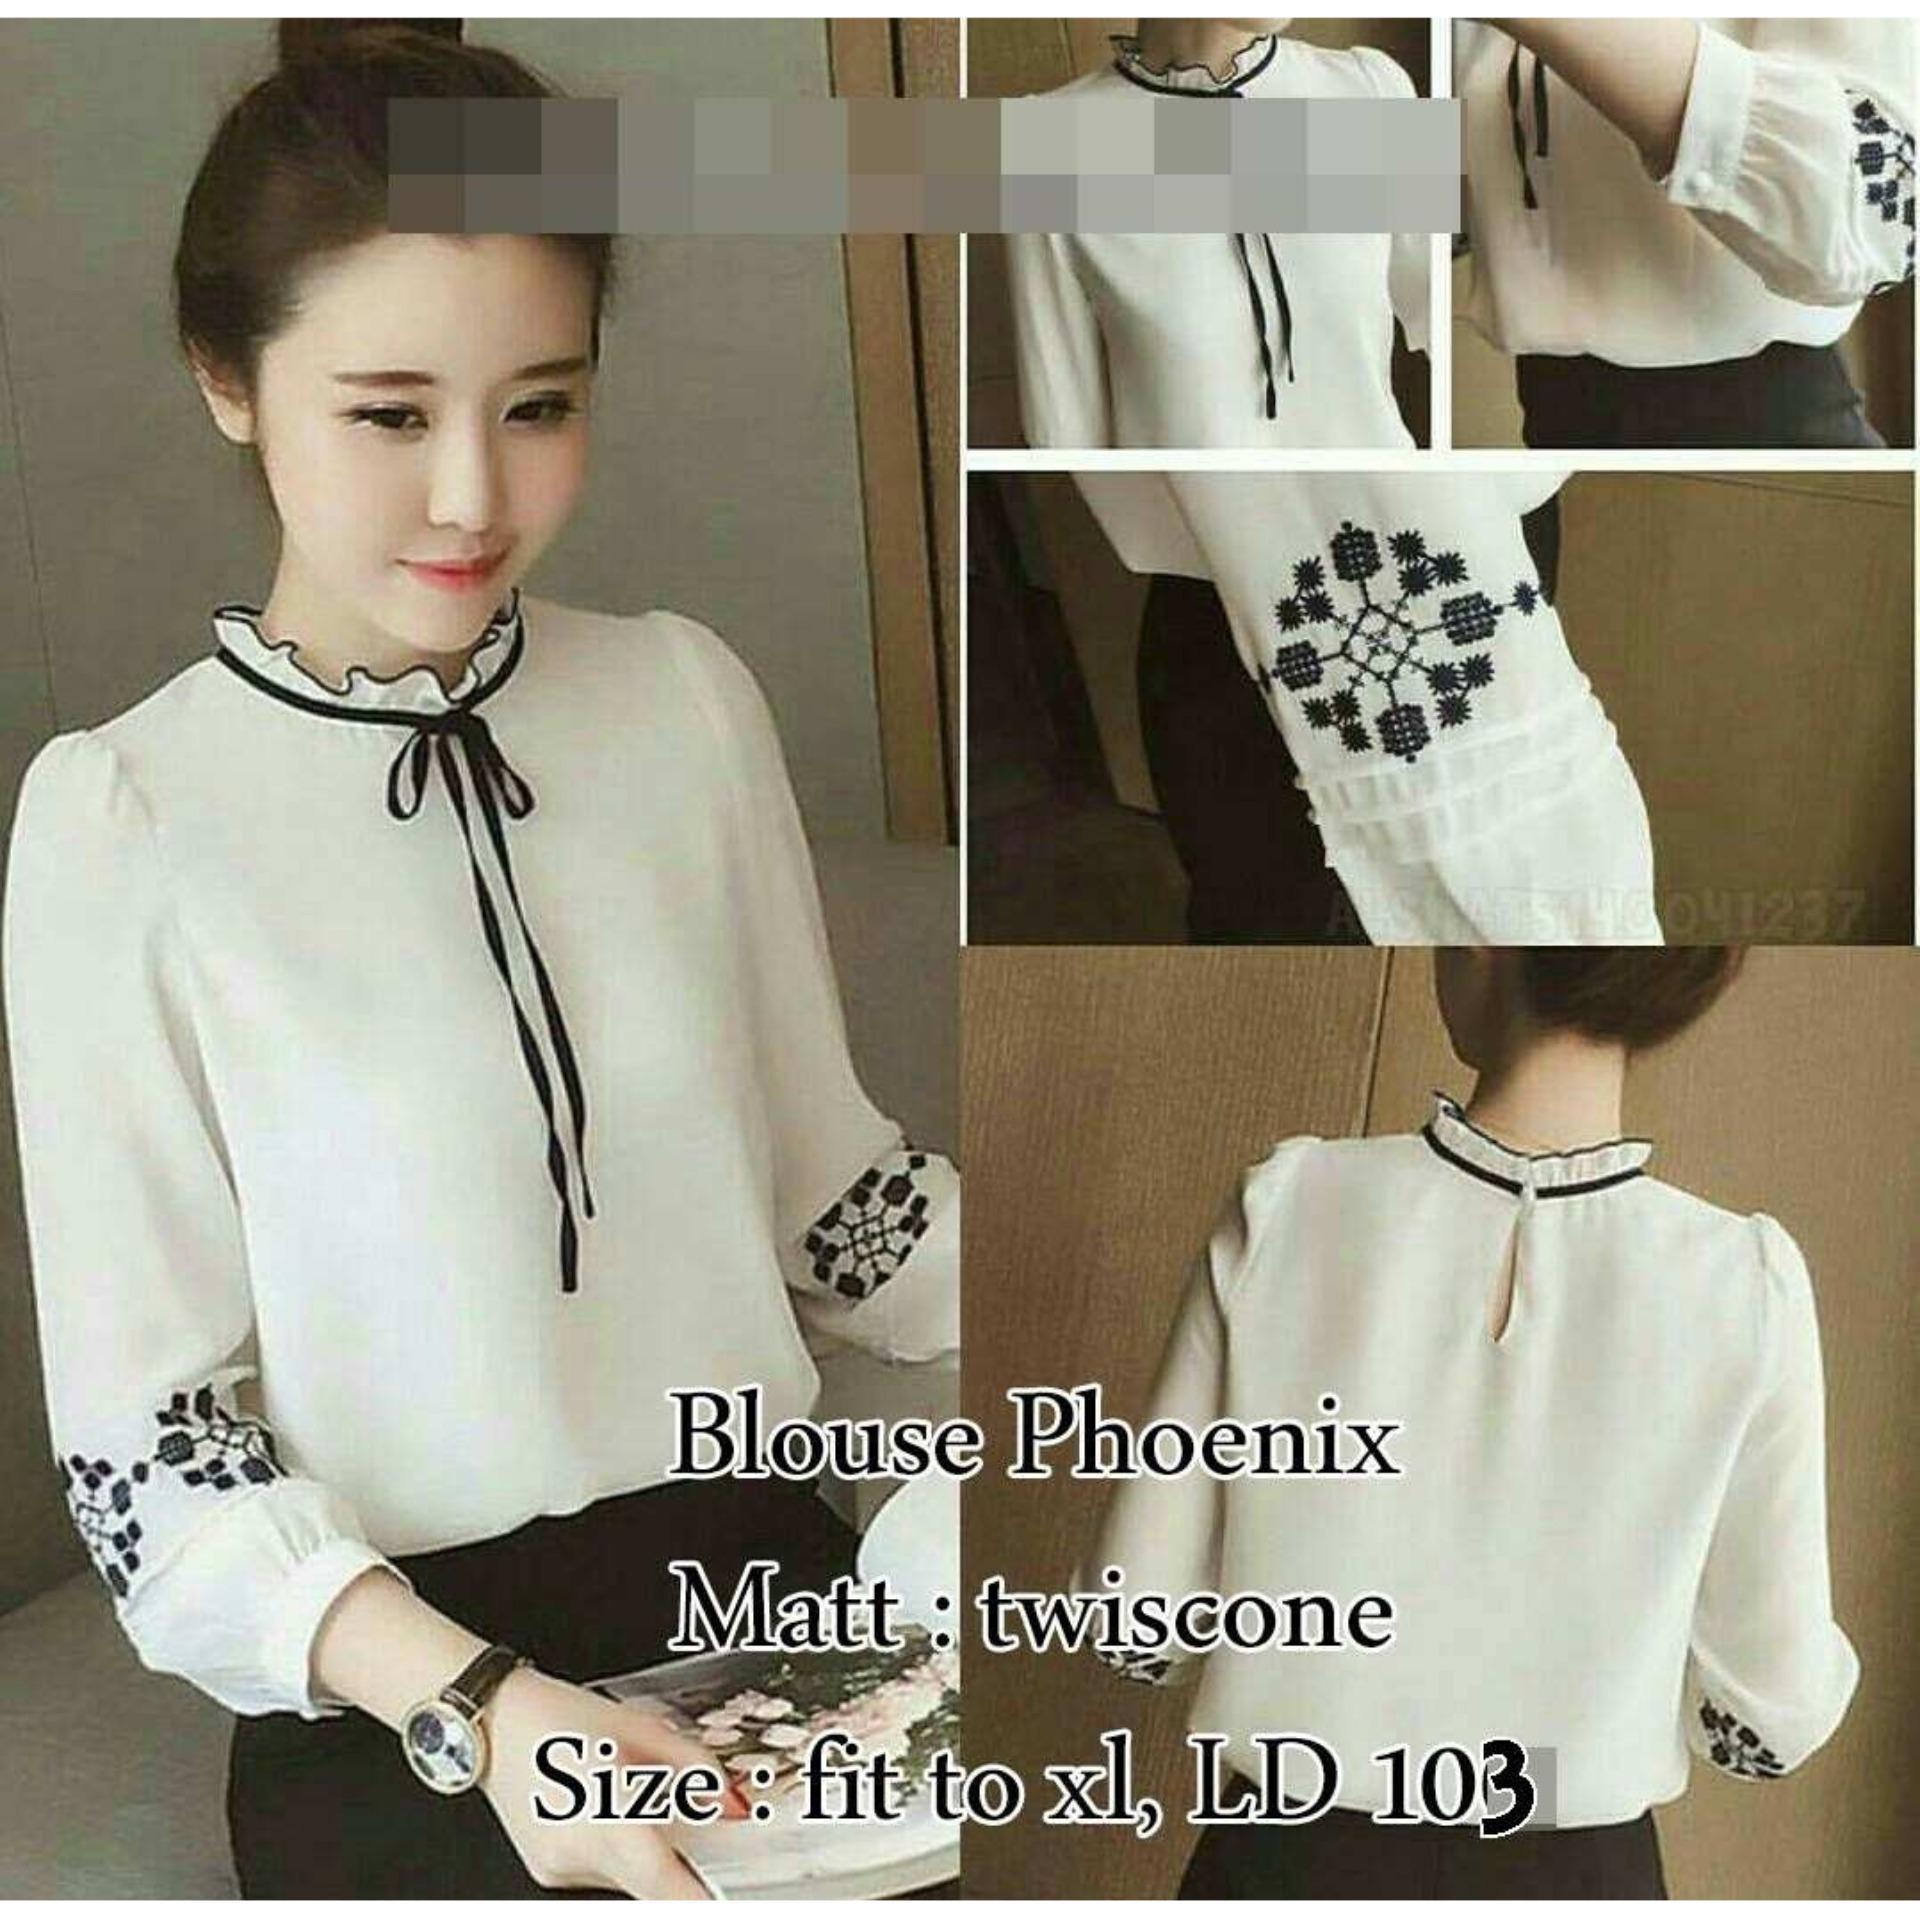 Blouse Phonix Black / Tunik Wanita Kaos Wanita Baju Wanita Atasan Wanita Blouse Wanita Dress Wanita